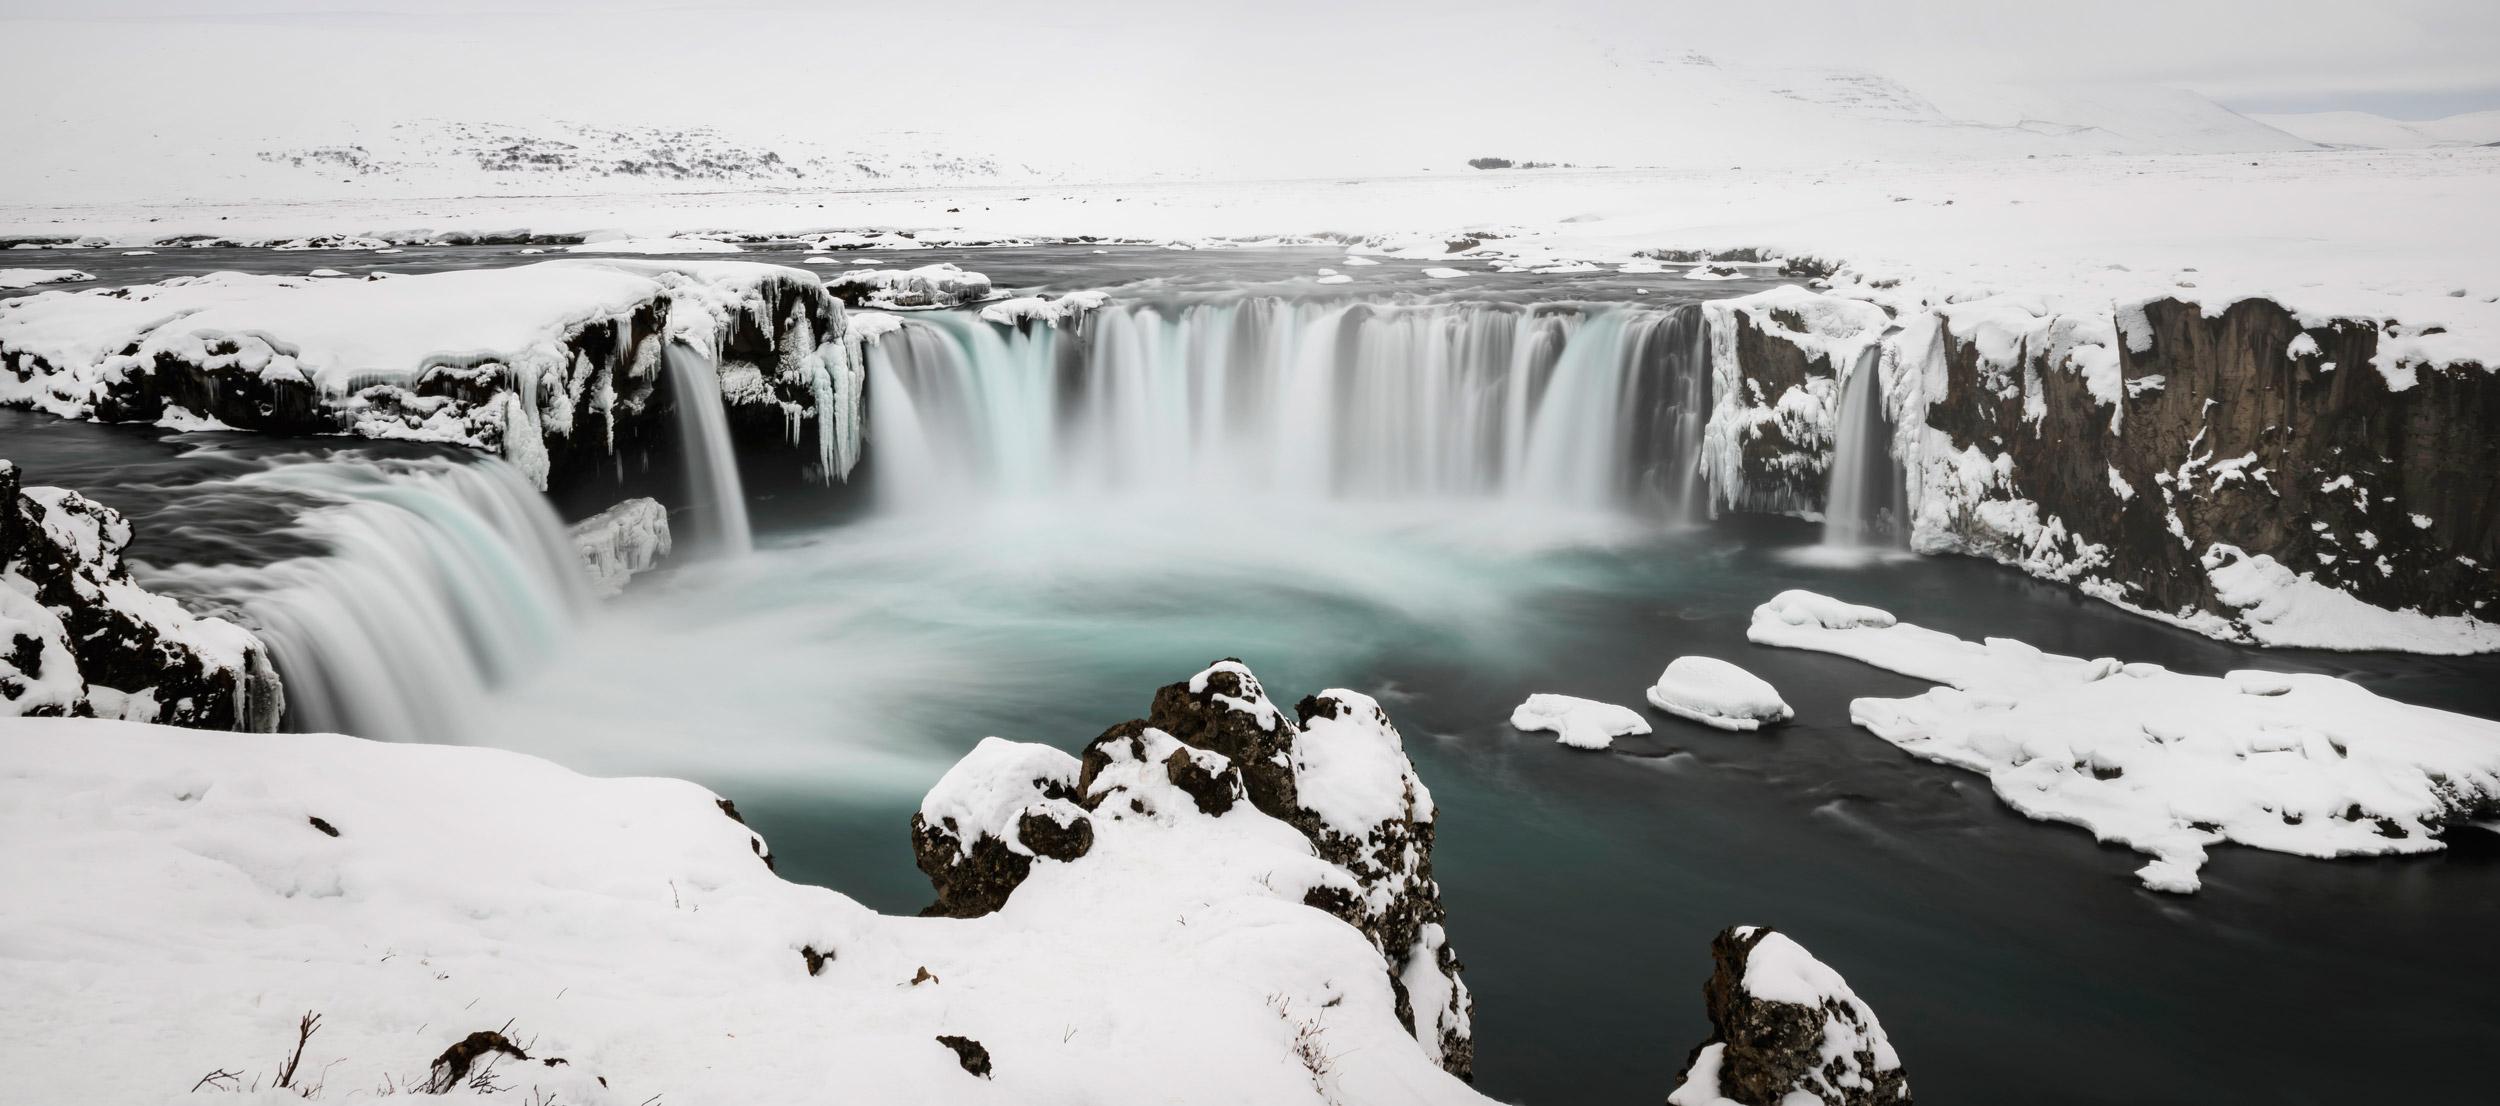 Voyage_Islande_Hiver_Anouk-Ruffieux_10.jpg